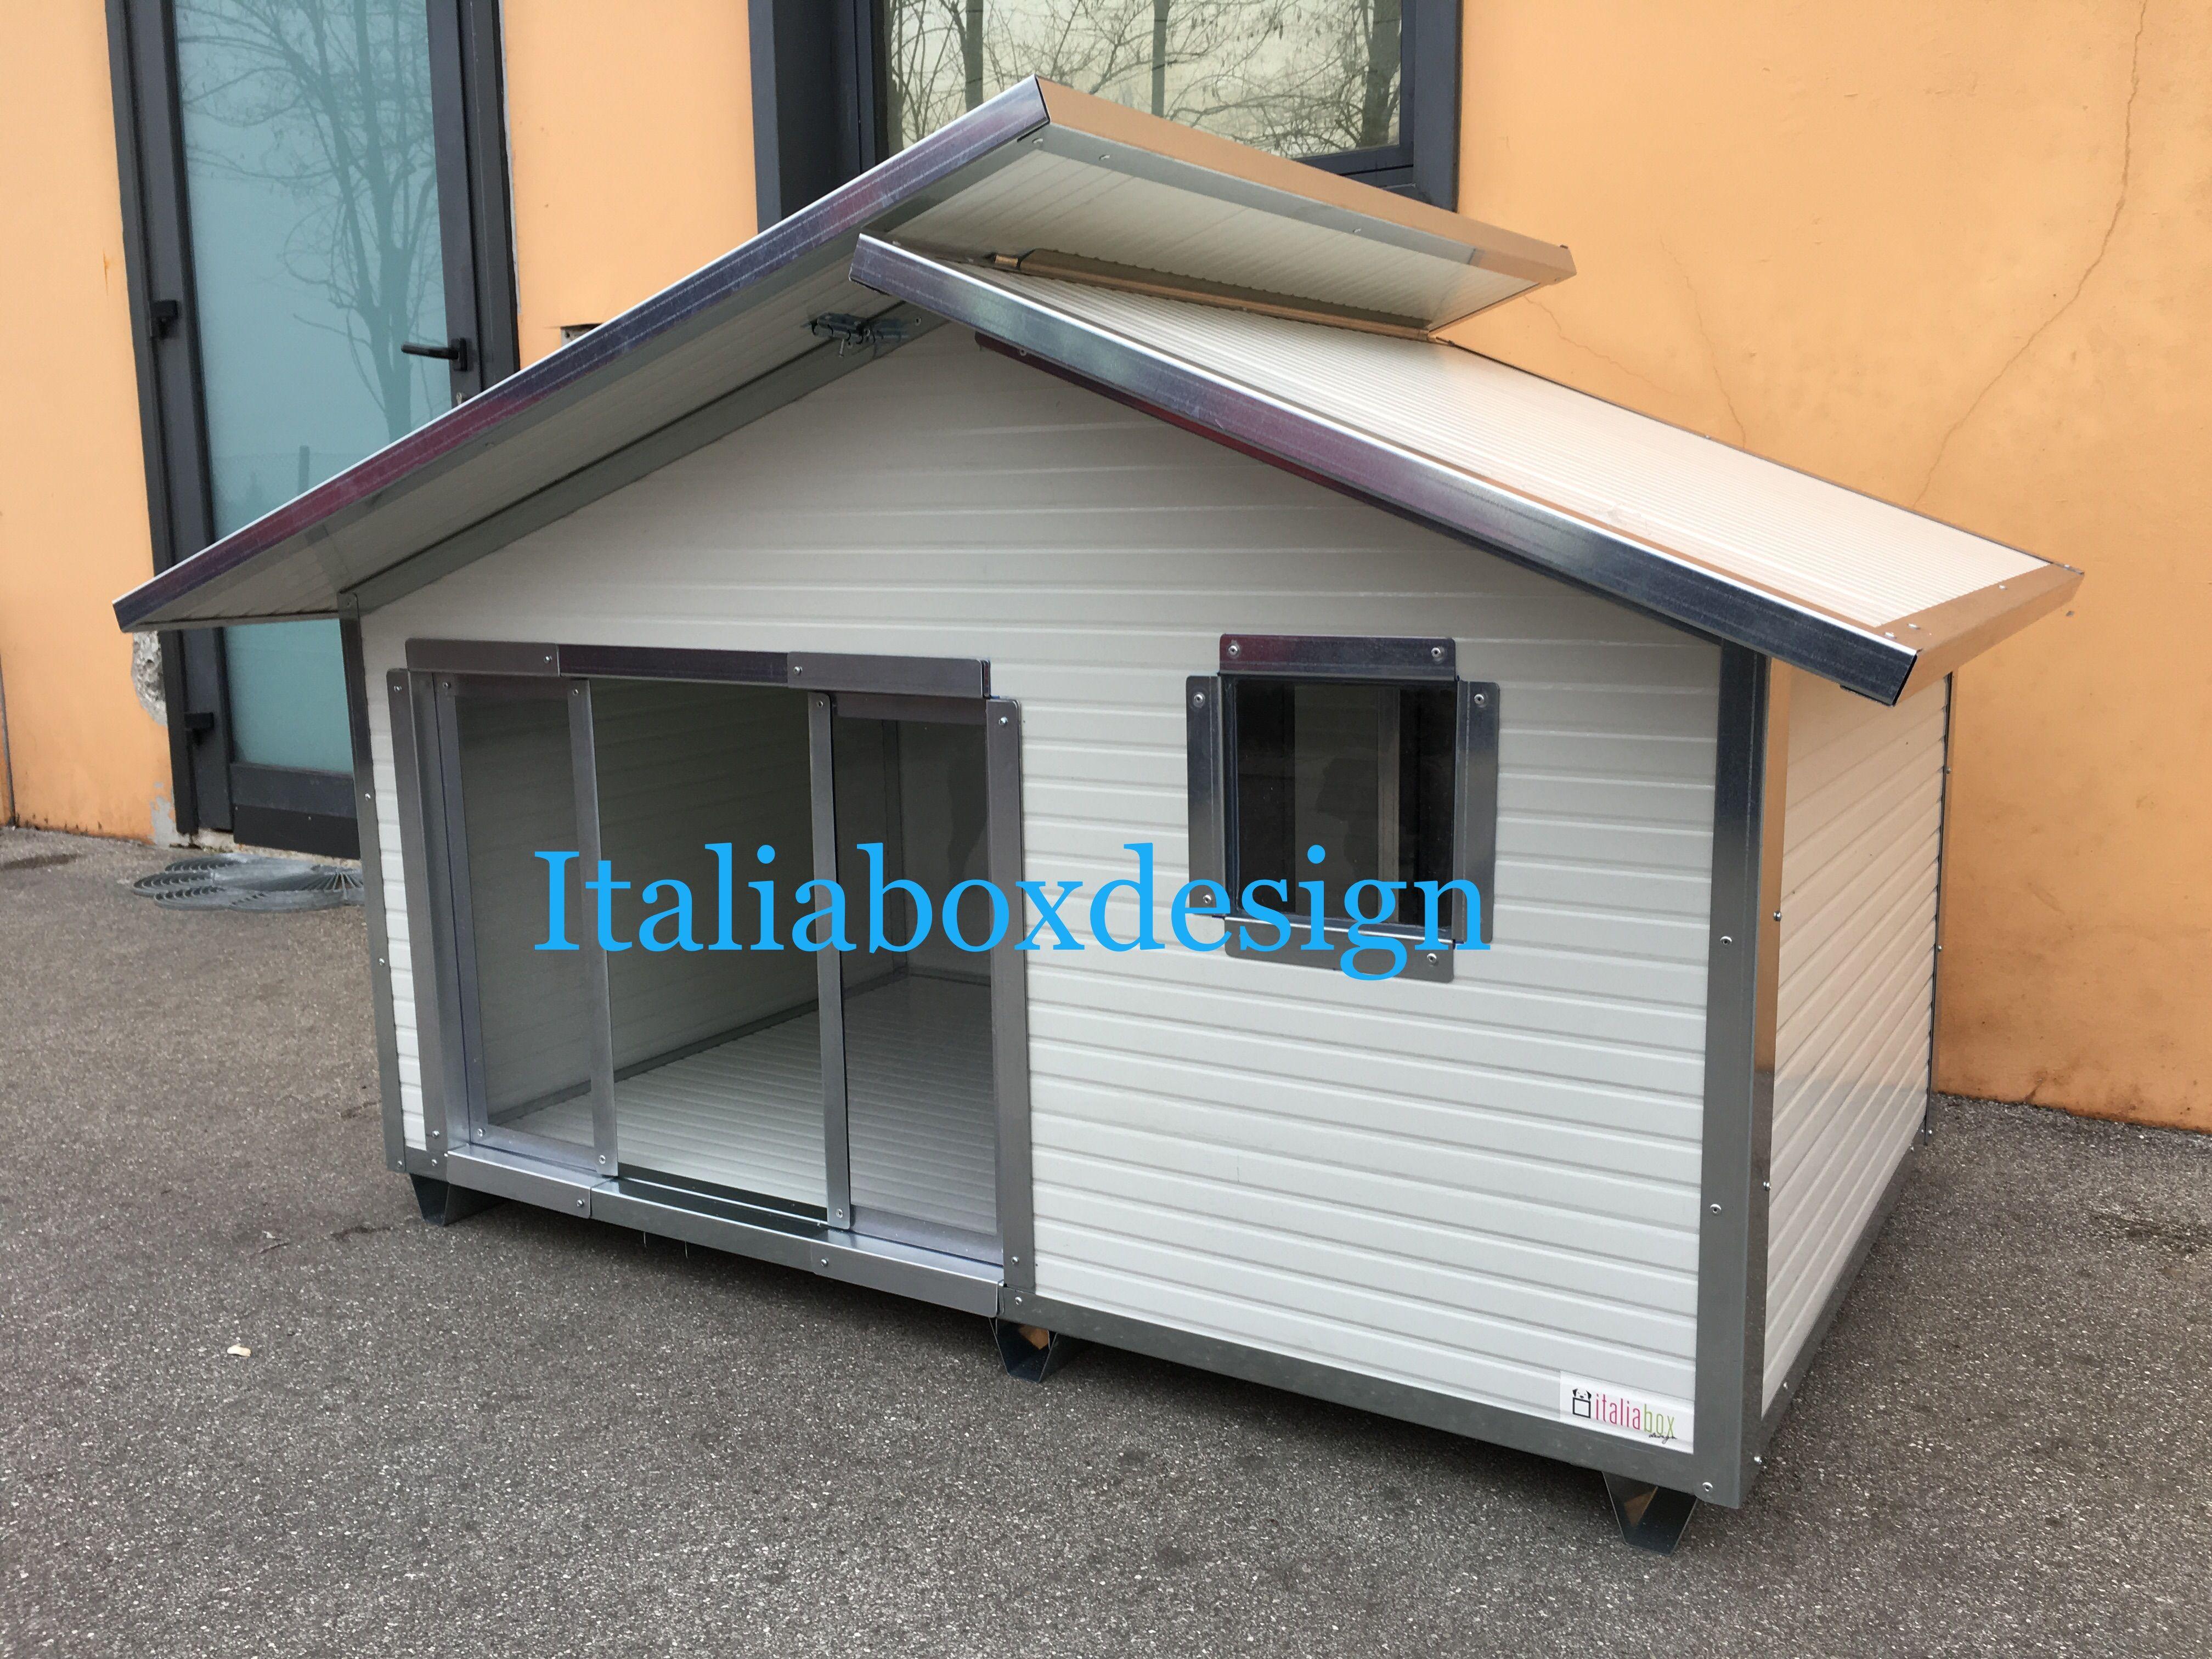 Cuccia per cani coibentata dog house pinterest cani for Costruire cuccia per cani coibentata